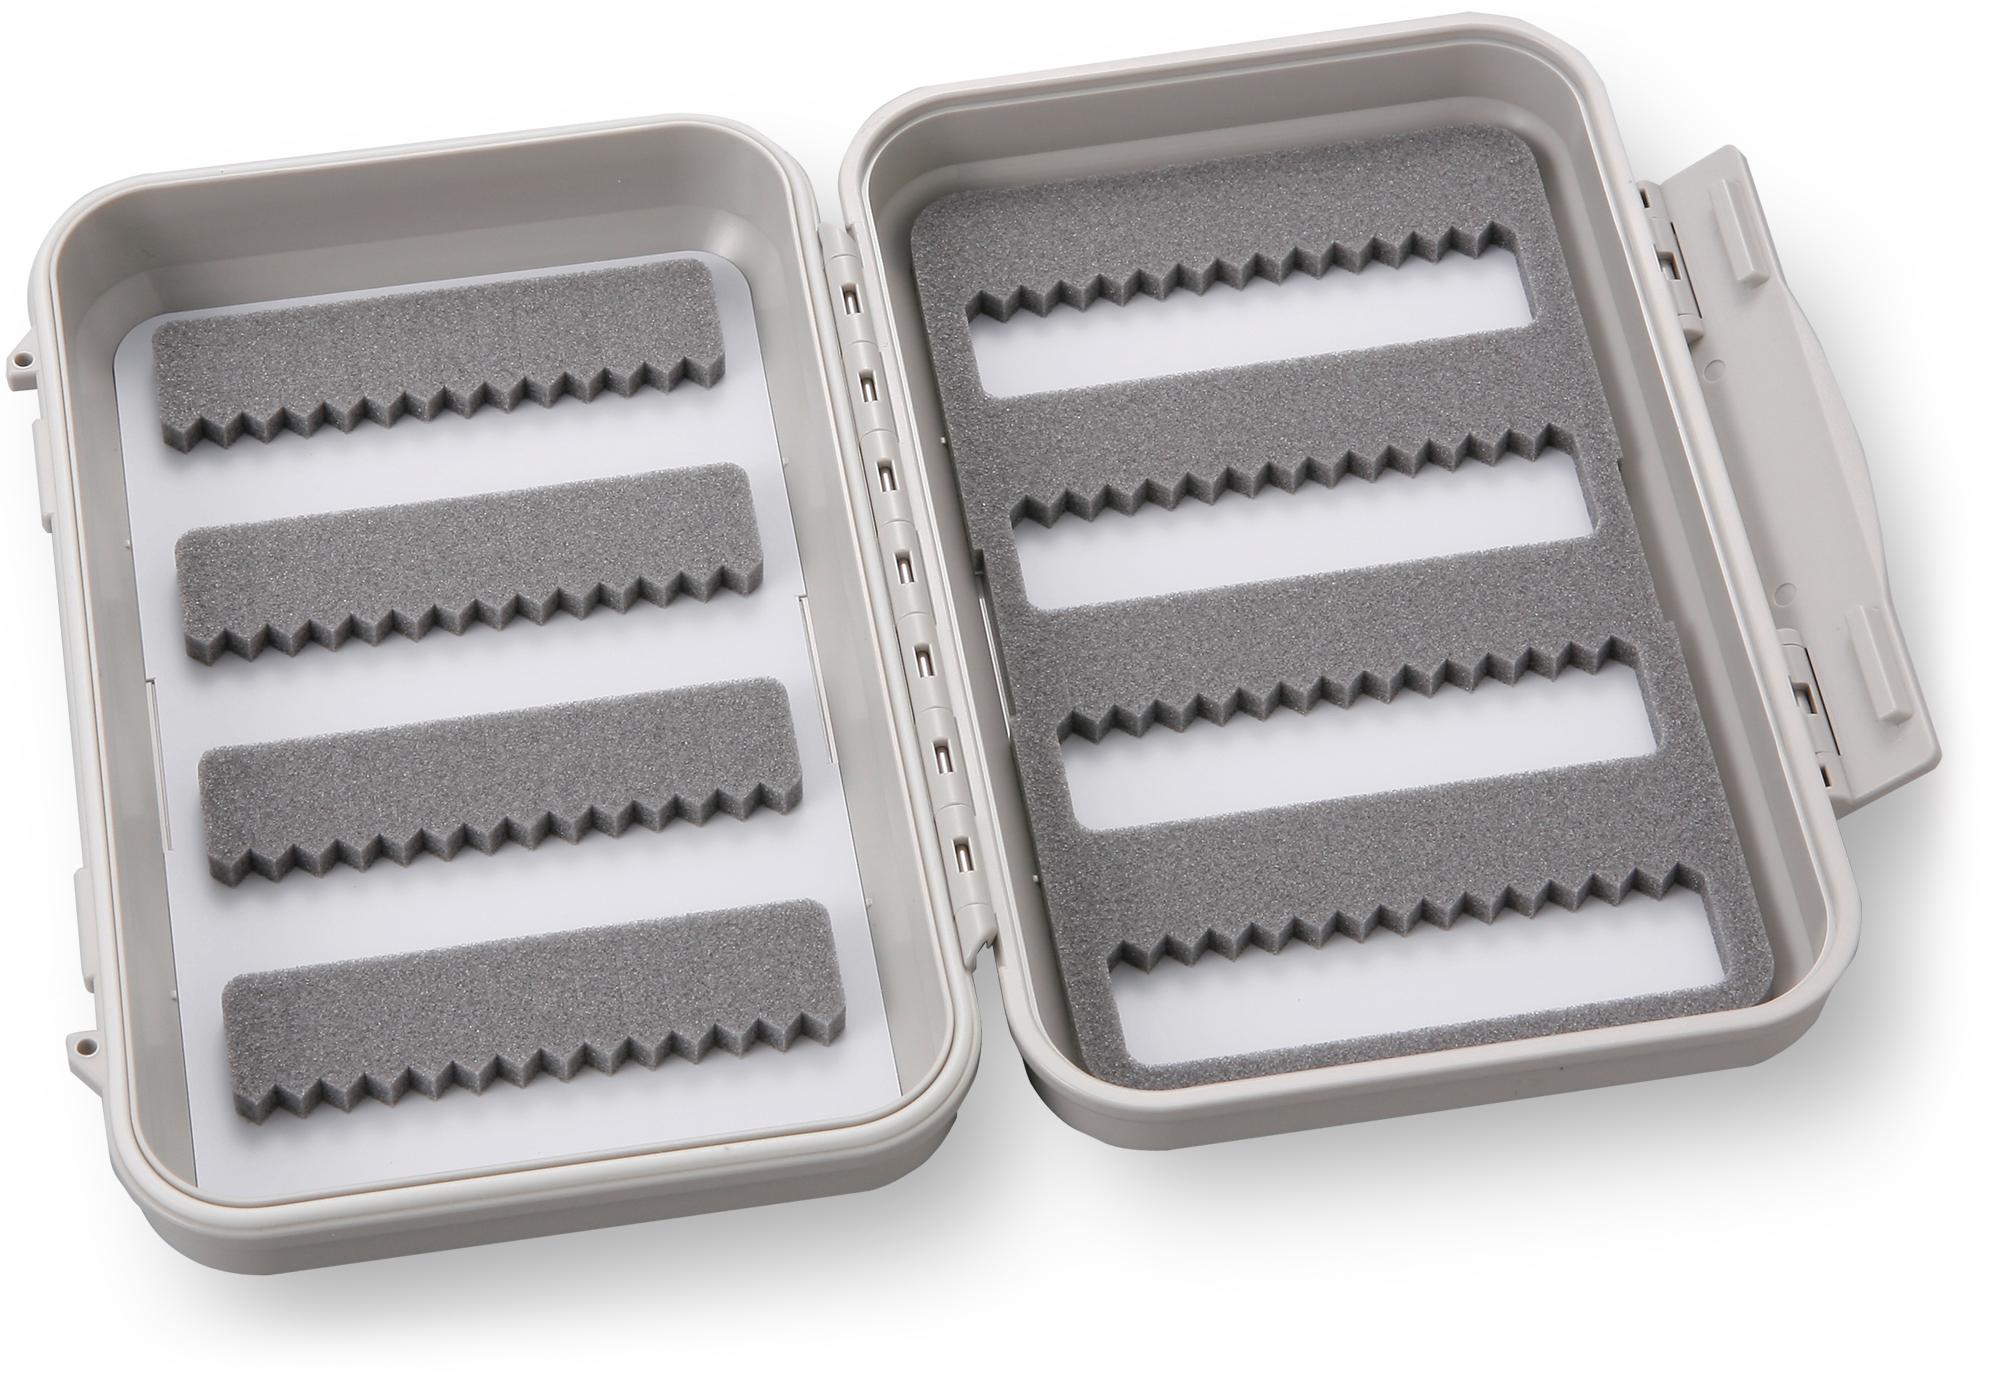 Medium 8-Row Waterproof Fly Box